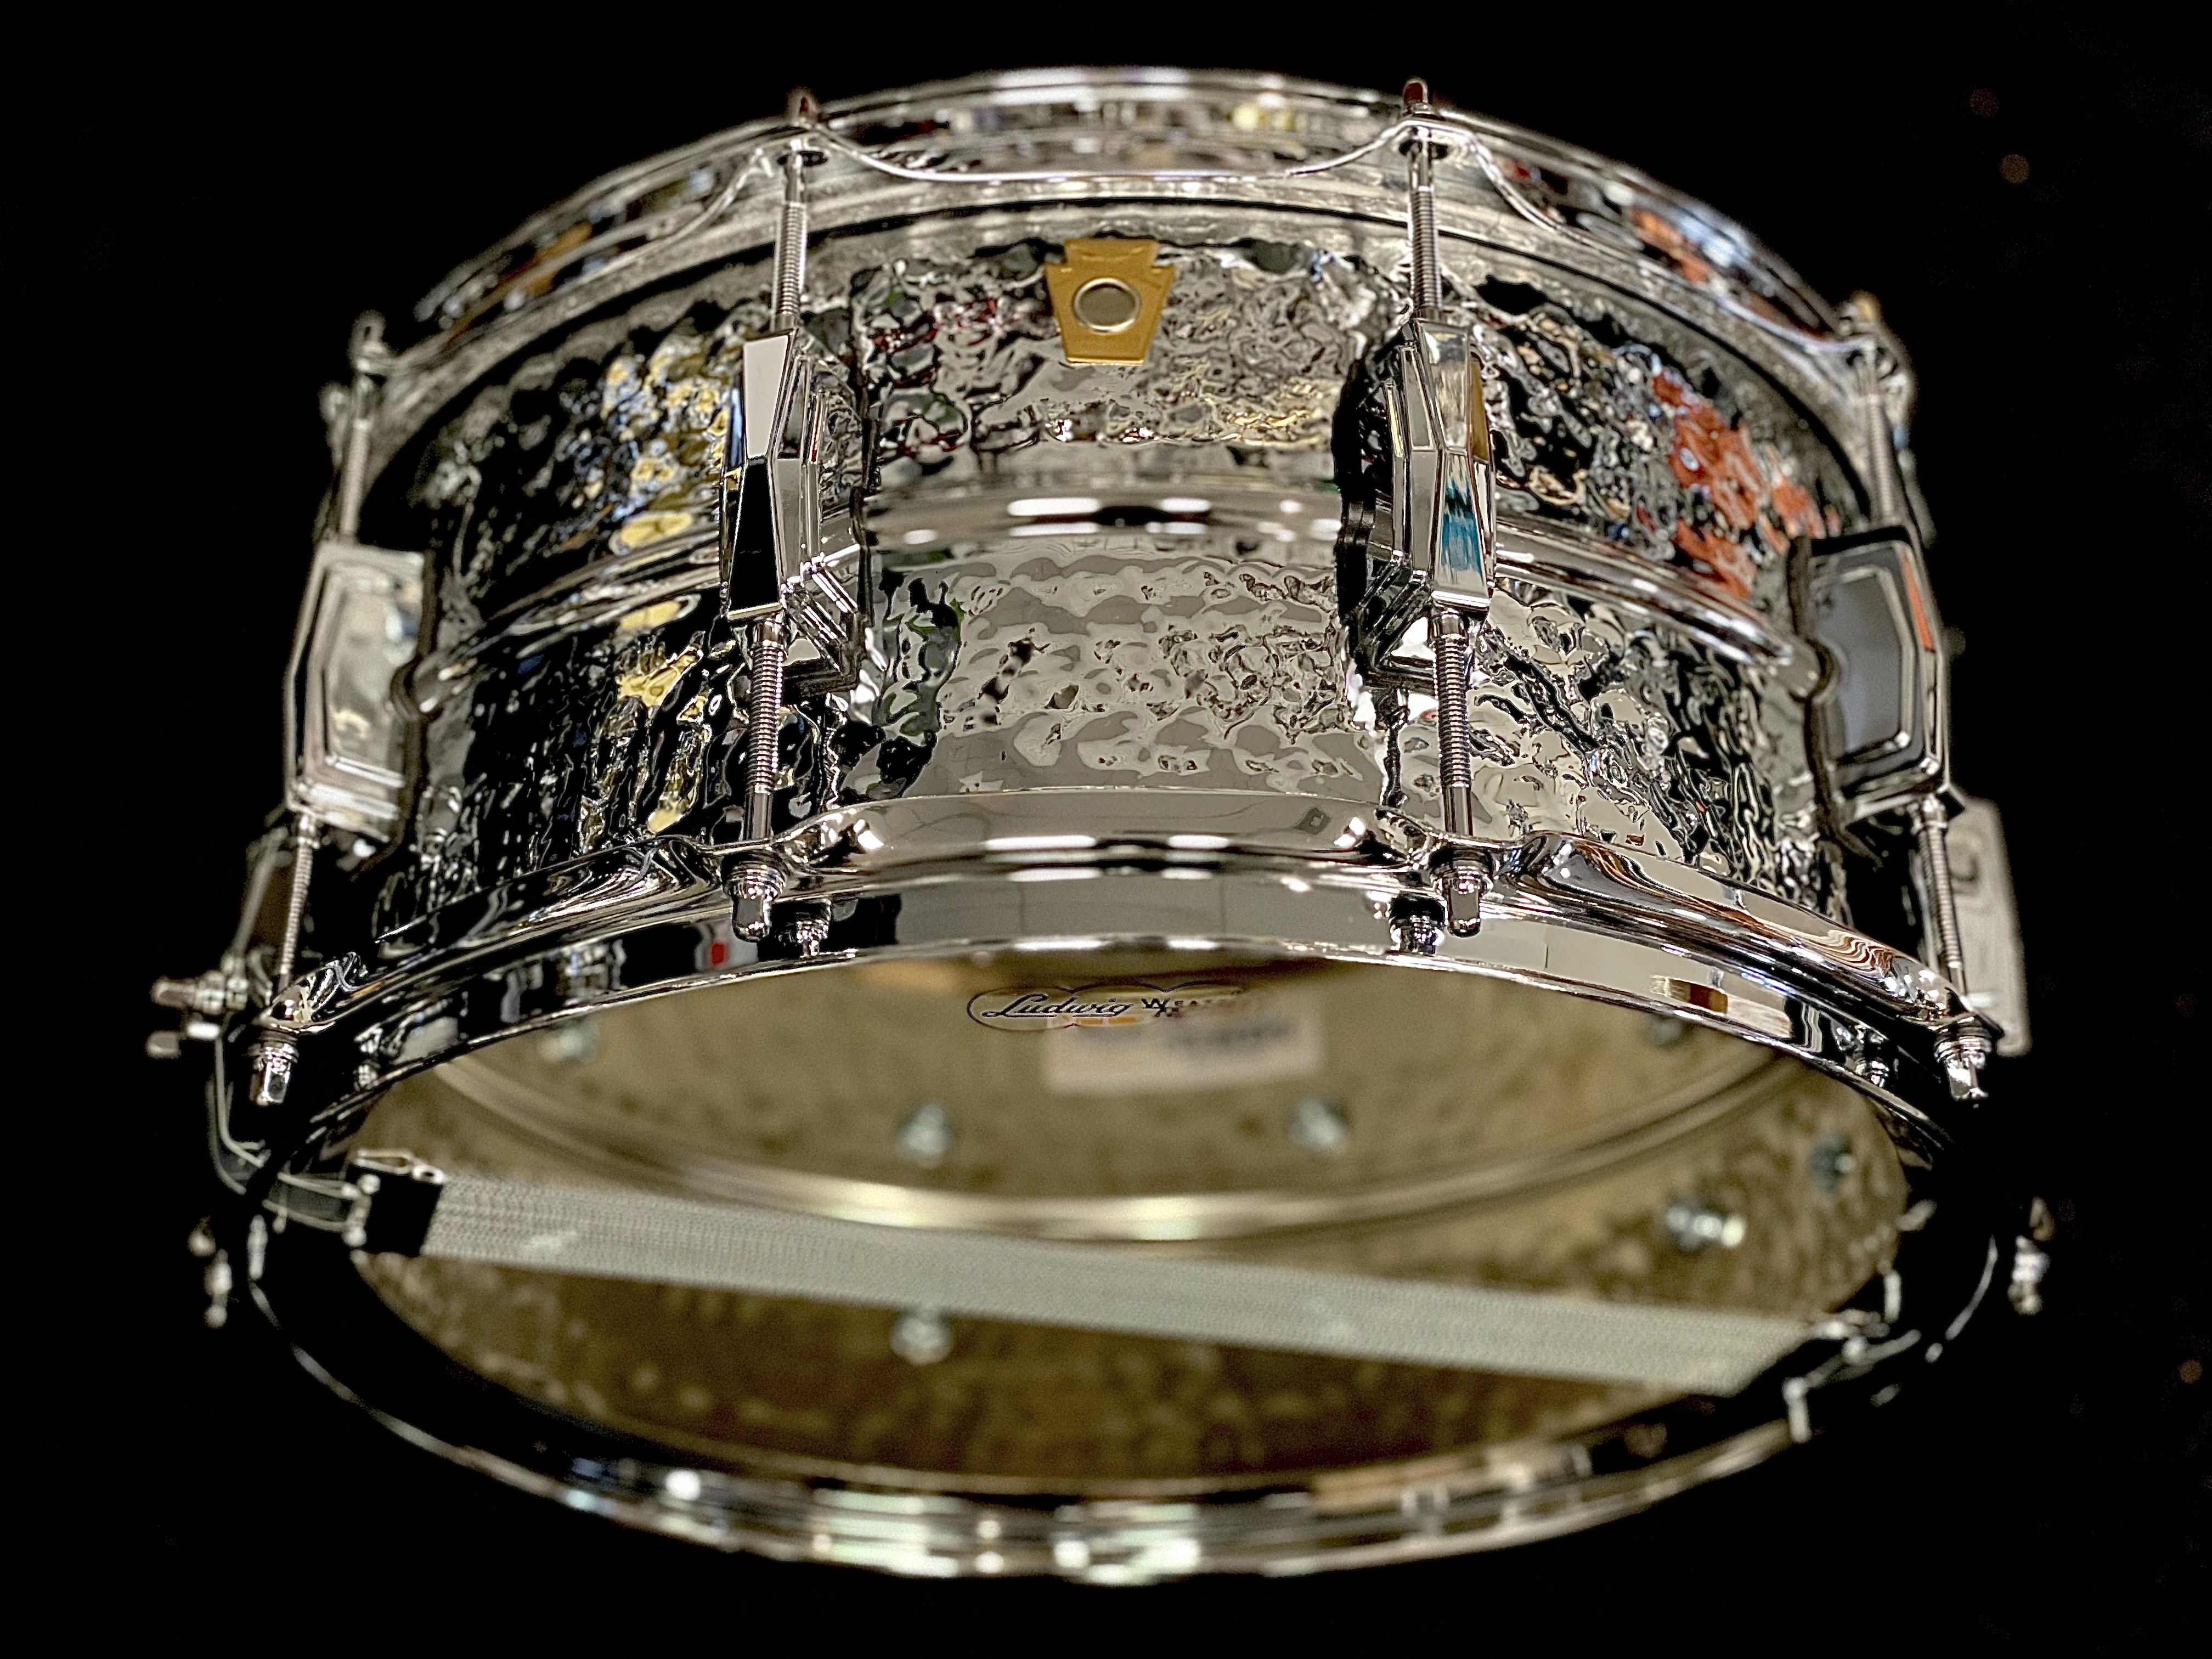 Ludwig LM402K Hammered Supraphonic 6.5x14 Aluminum Snare Drum